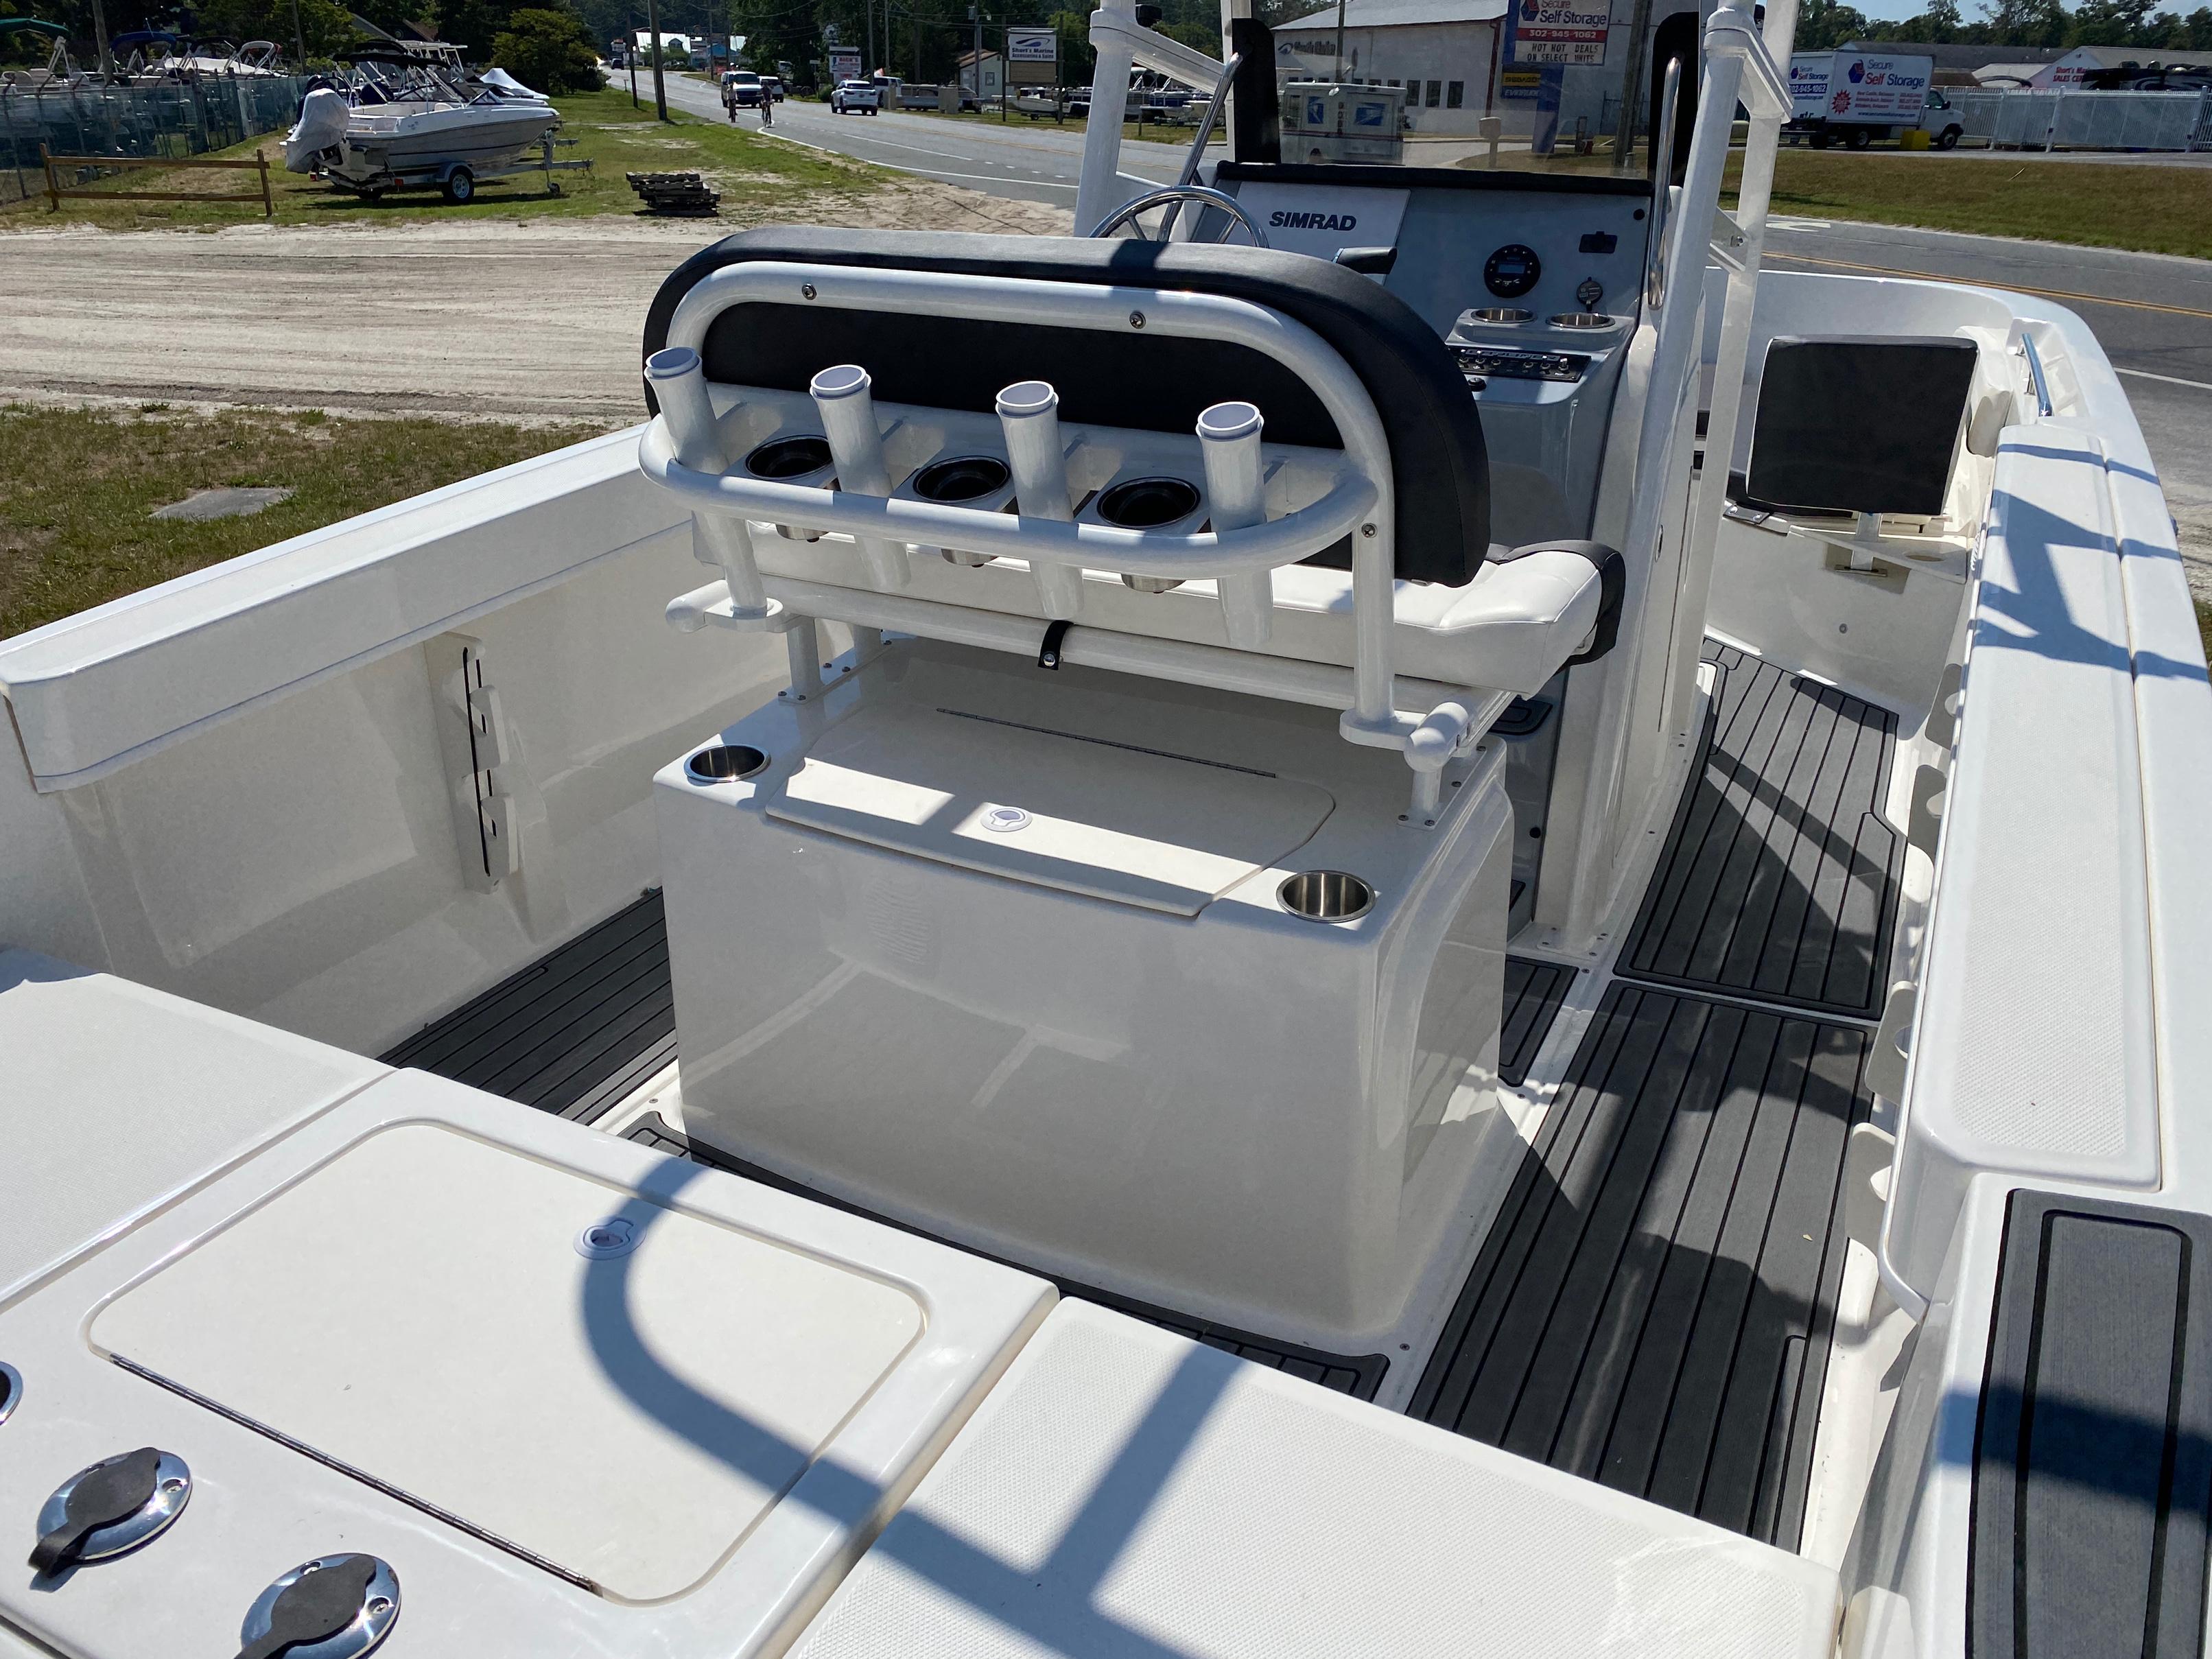 2020 Bayliner boat for sale, model of the boat is Trophy 22CC & Image # 5 of 17